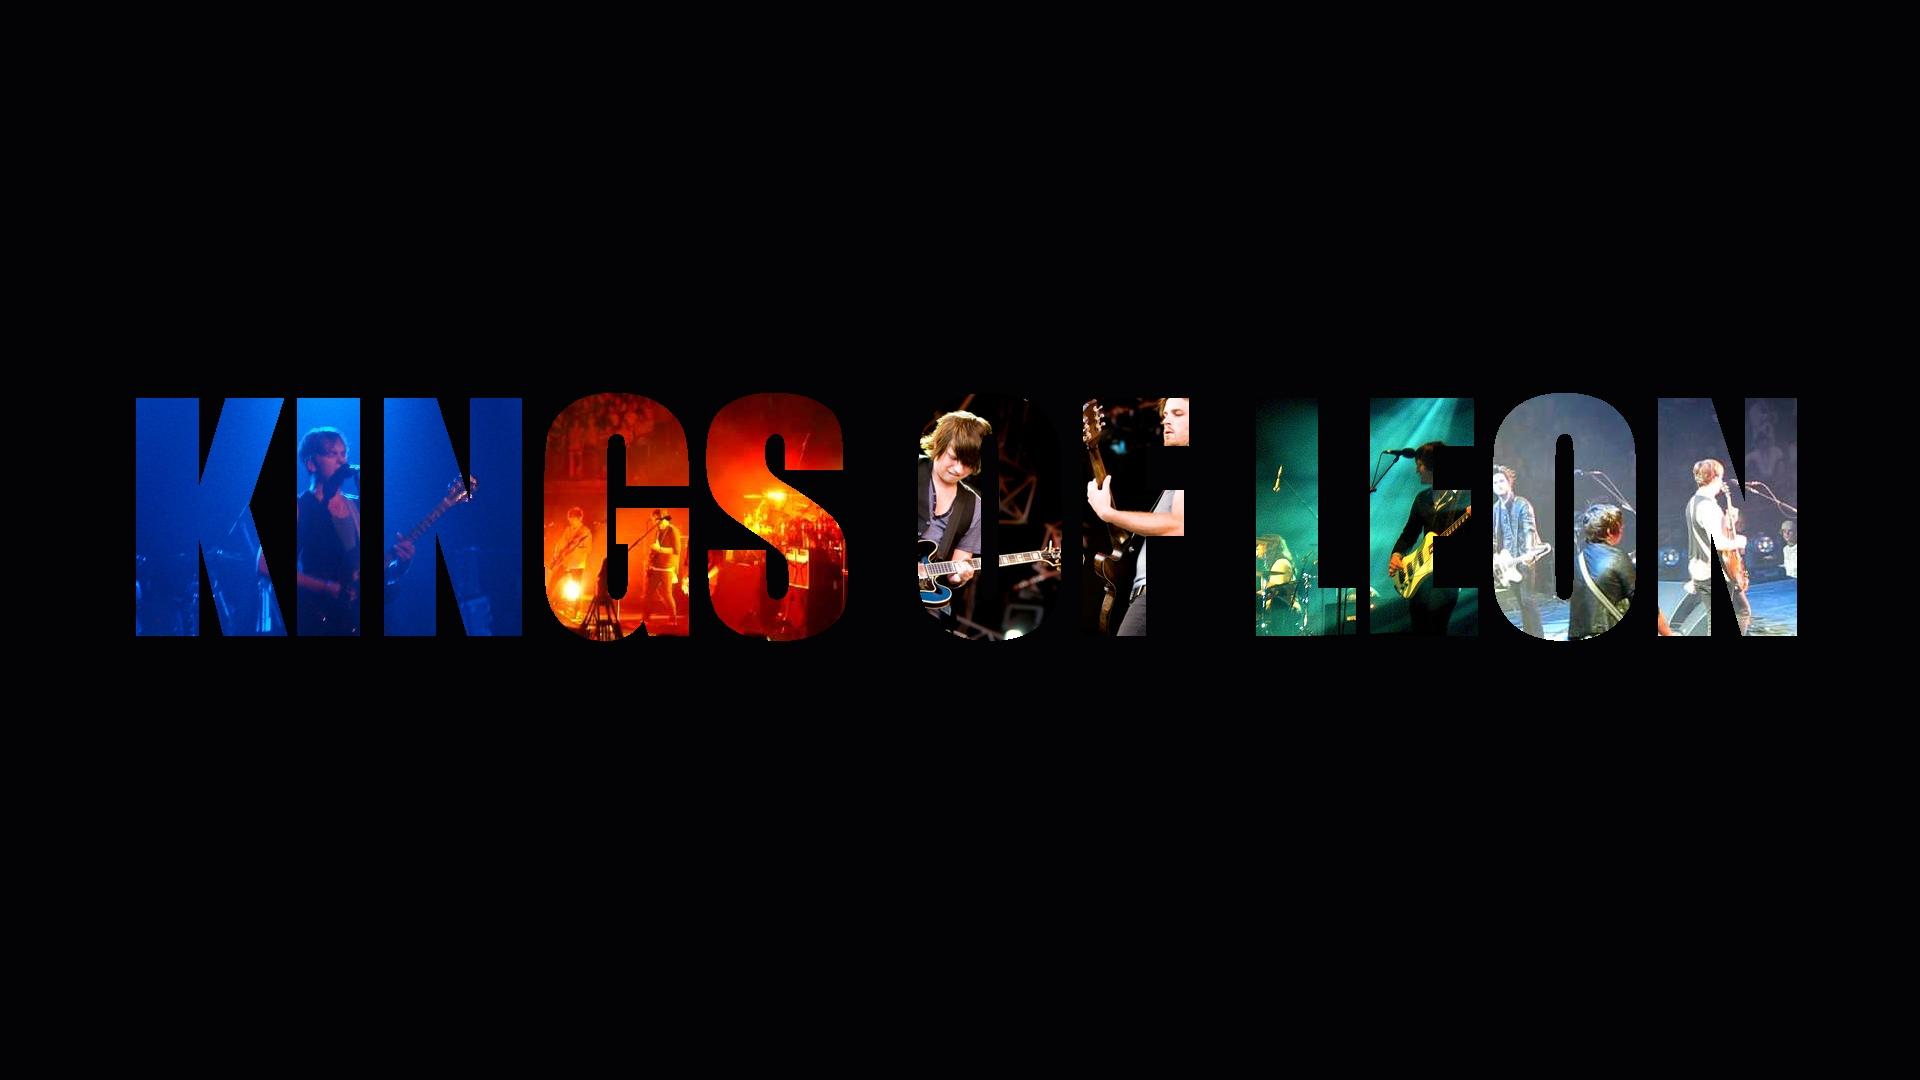 9 HD Kings Of Leon Band Wallpapers - HDWallSource.com